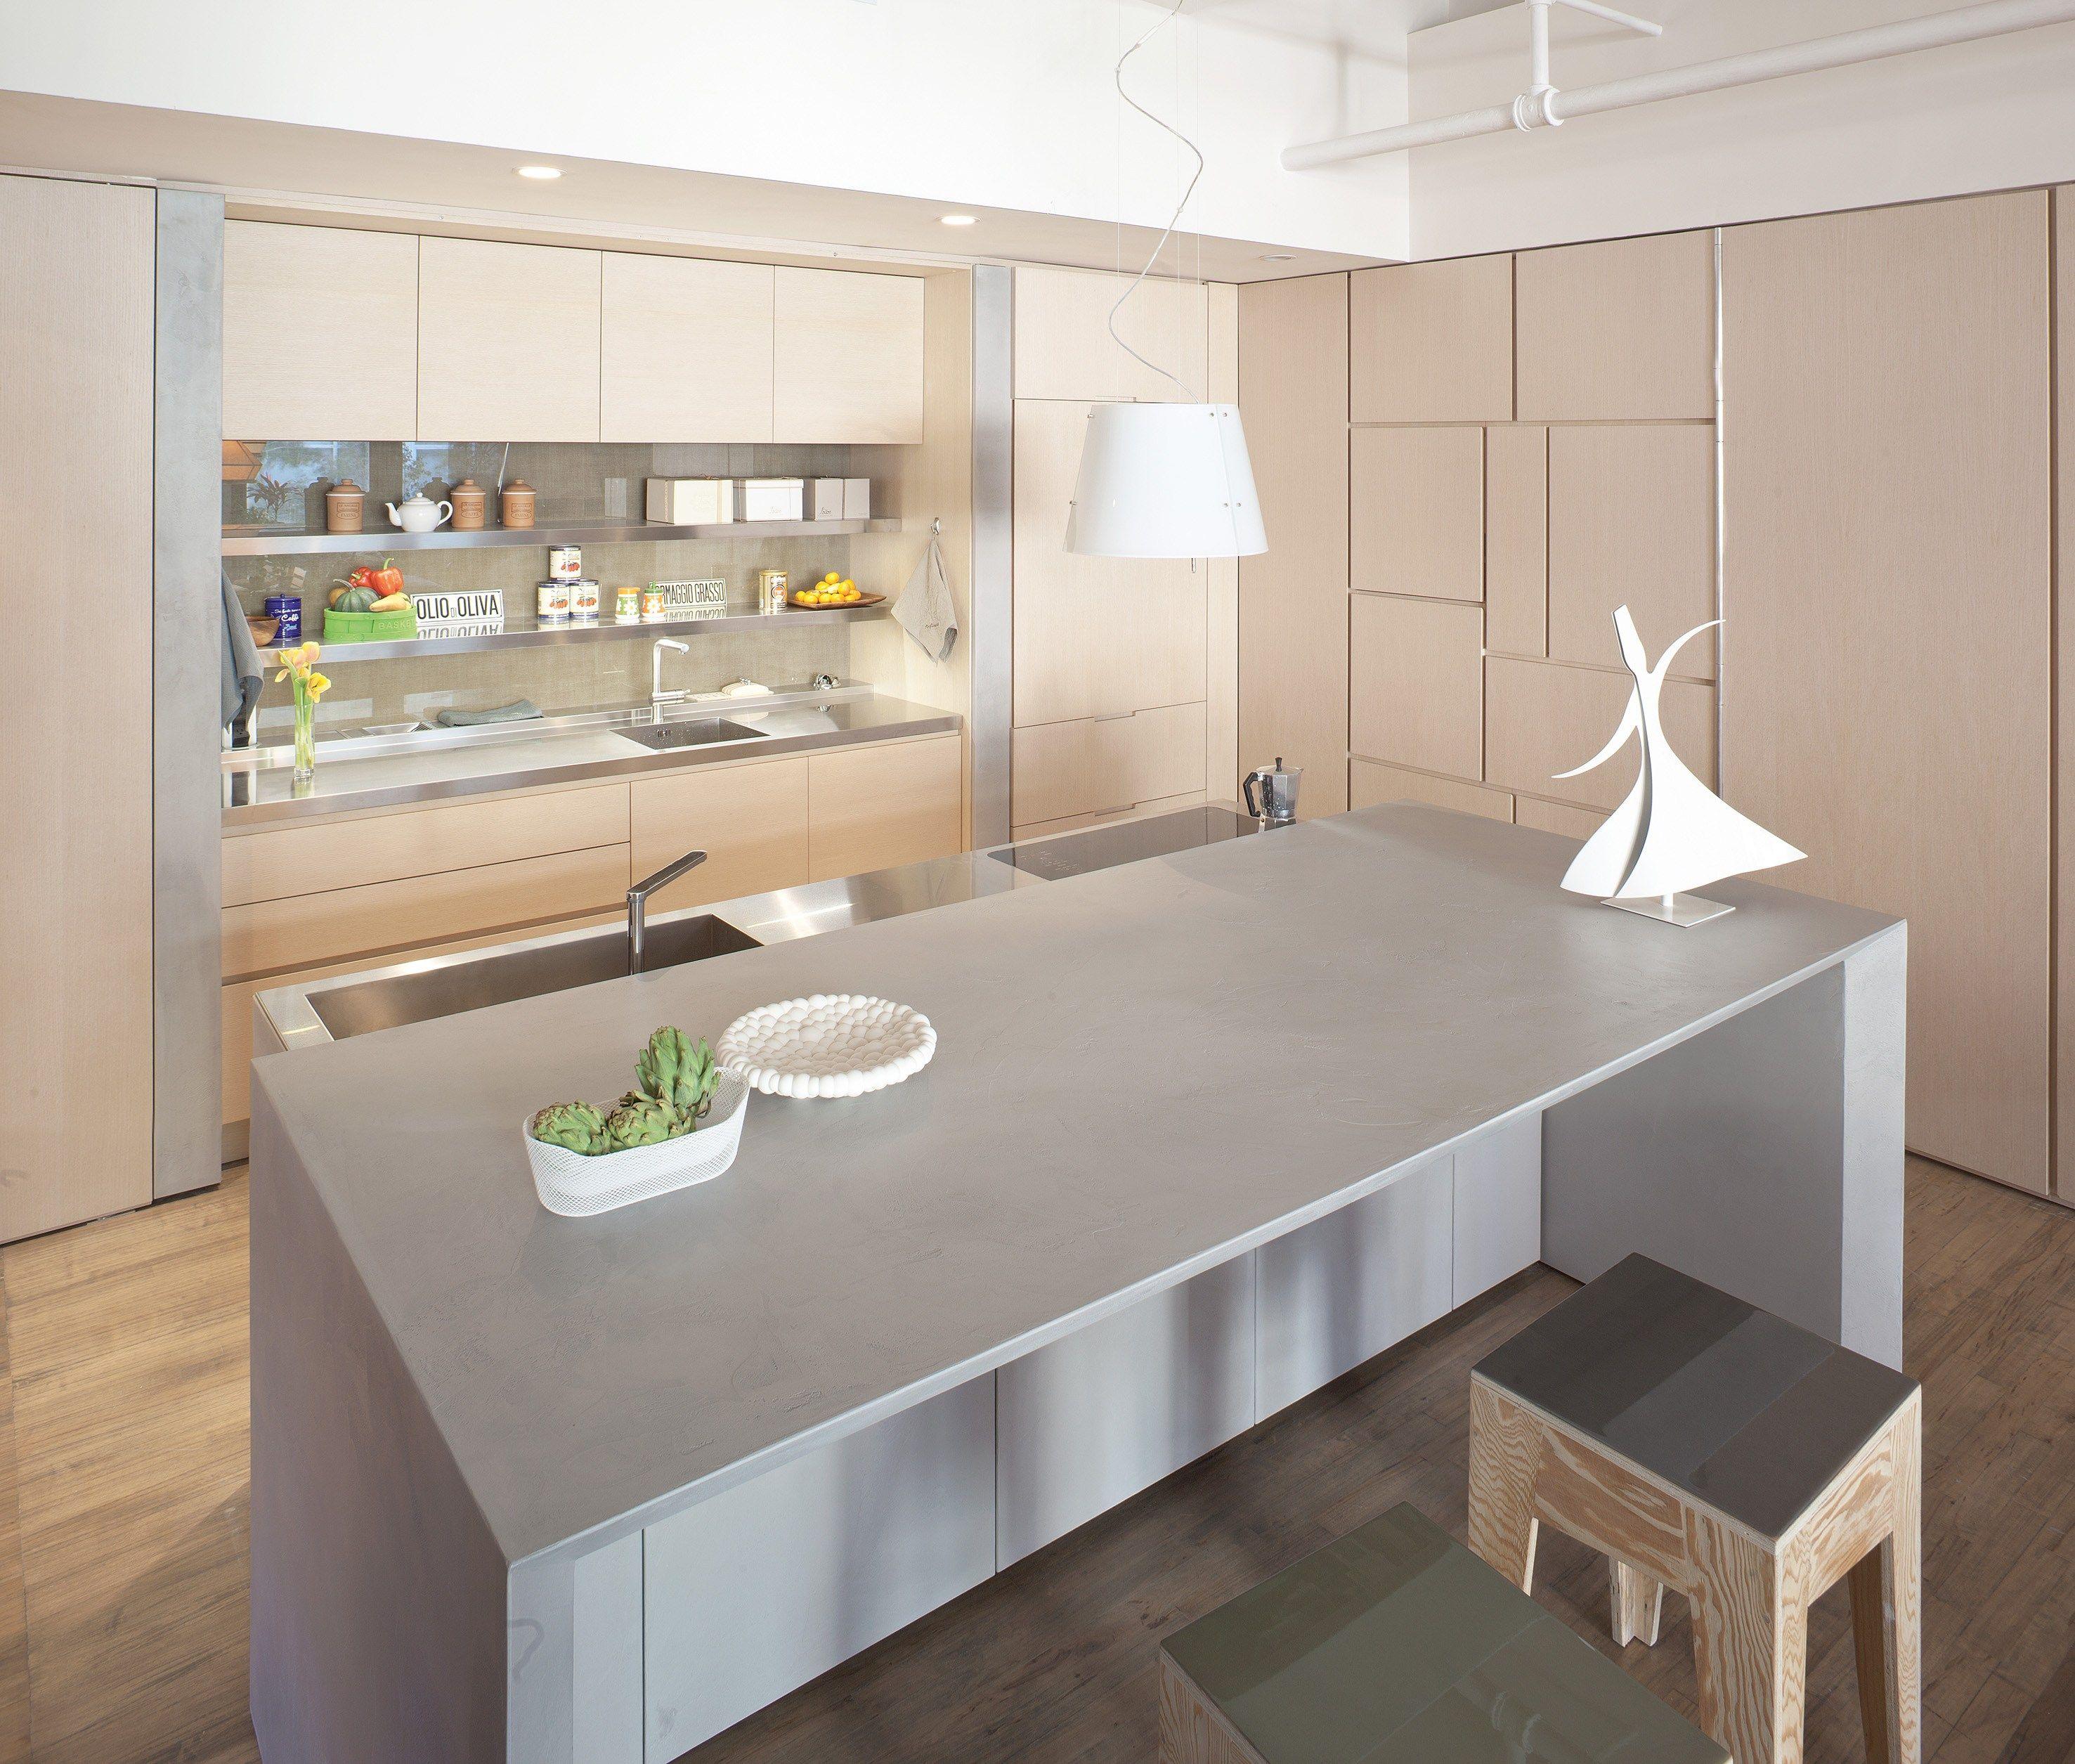 Kitchen without handles by tm italia cucine - Cucine senza elettrodomestici ...